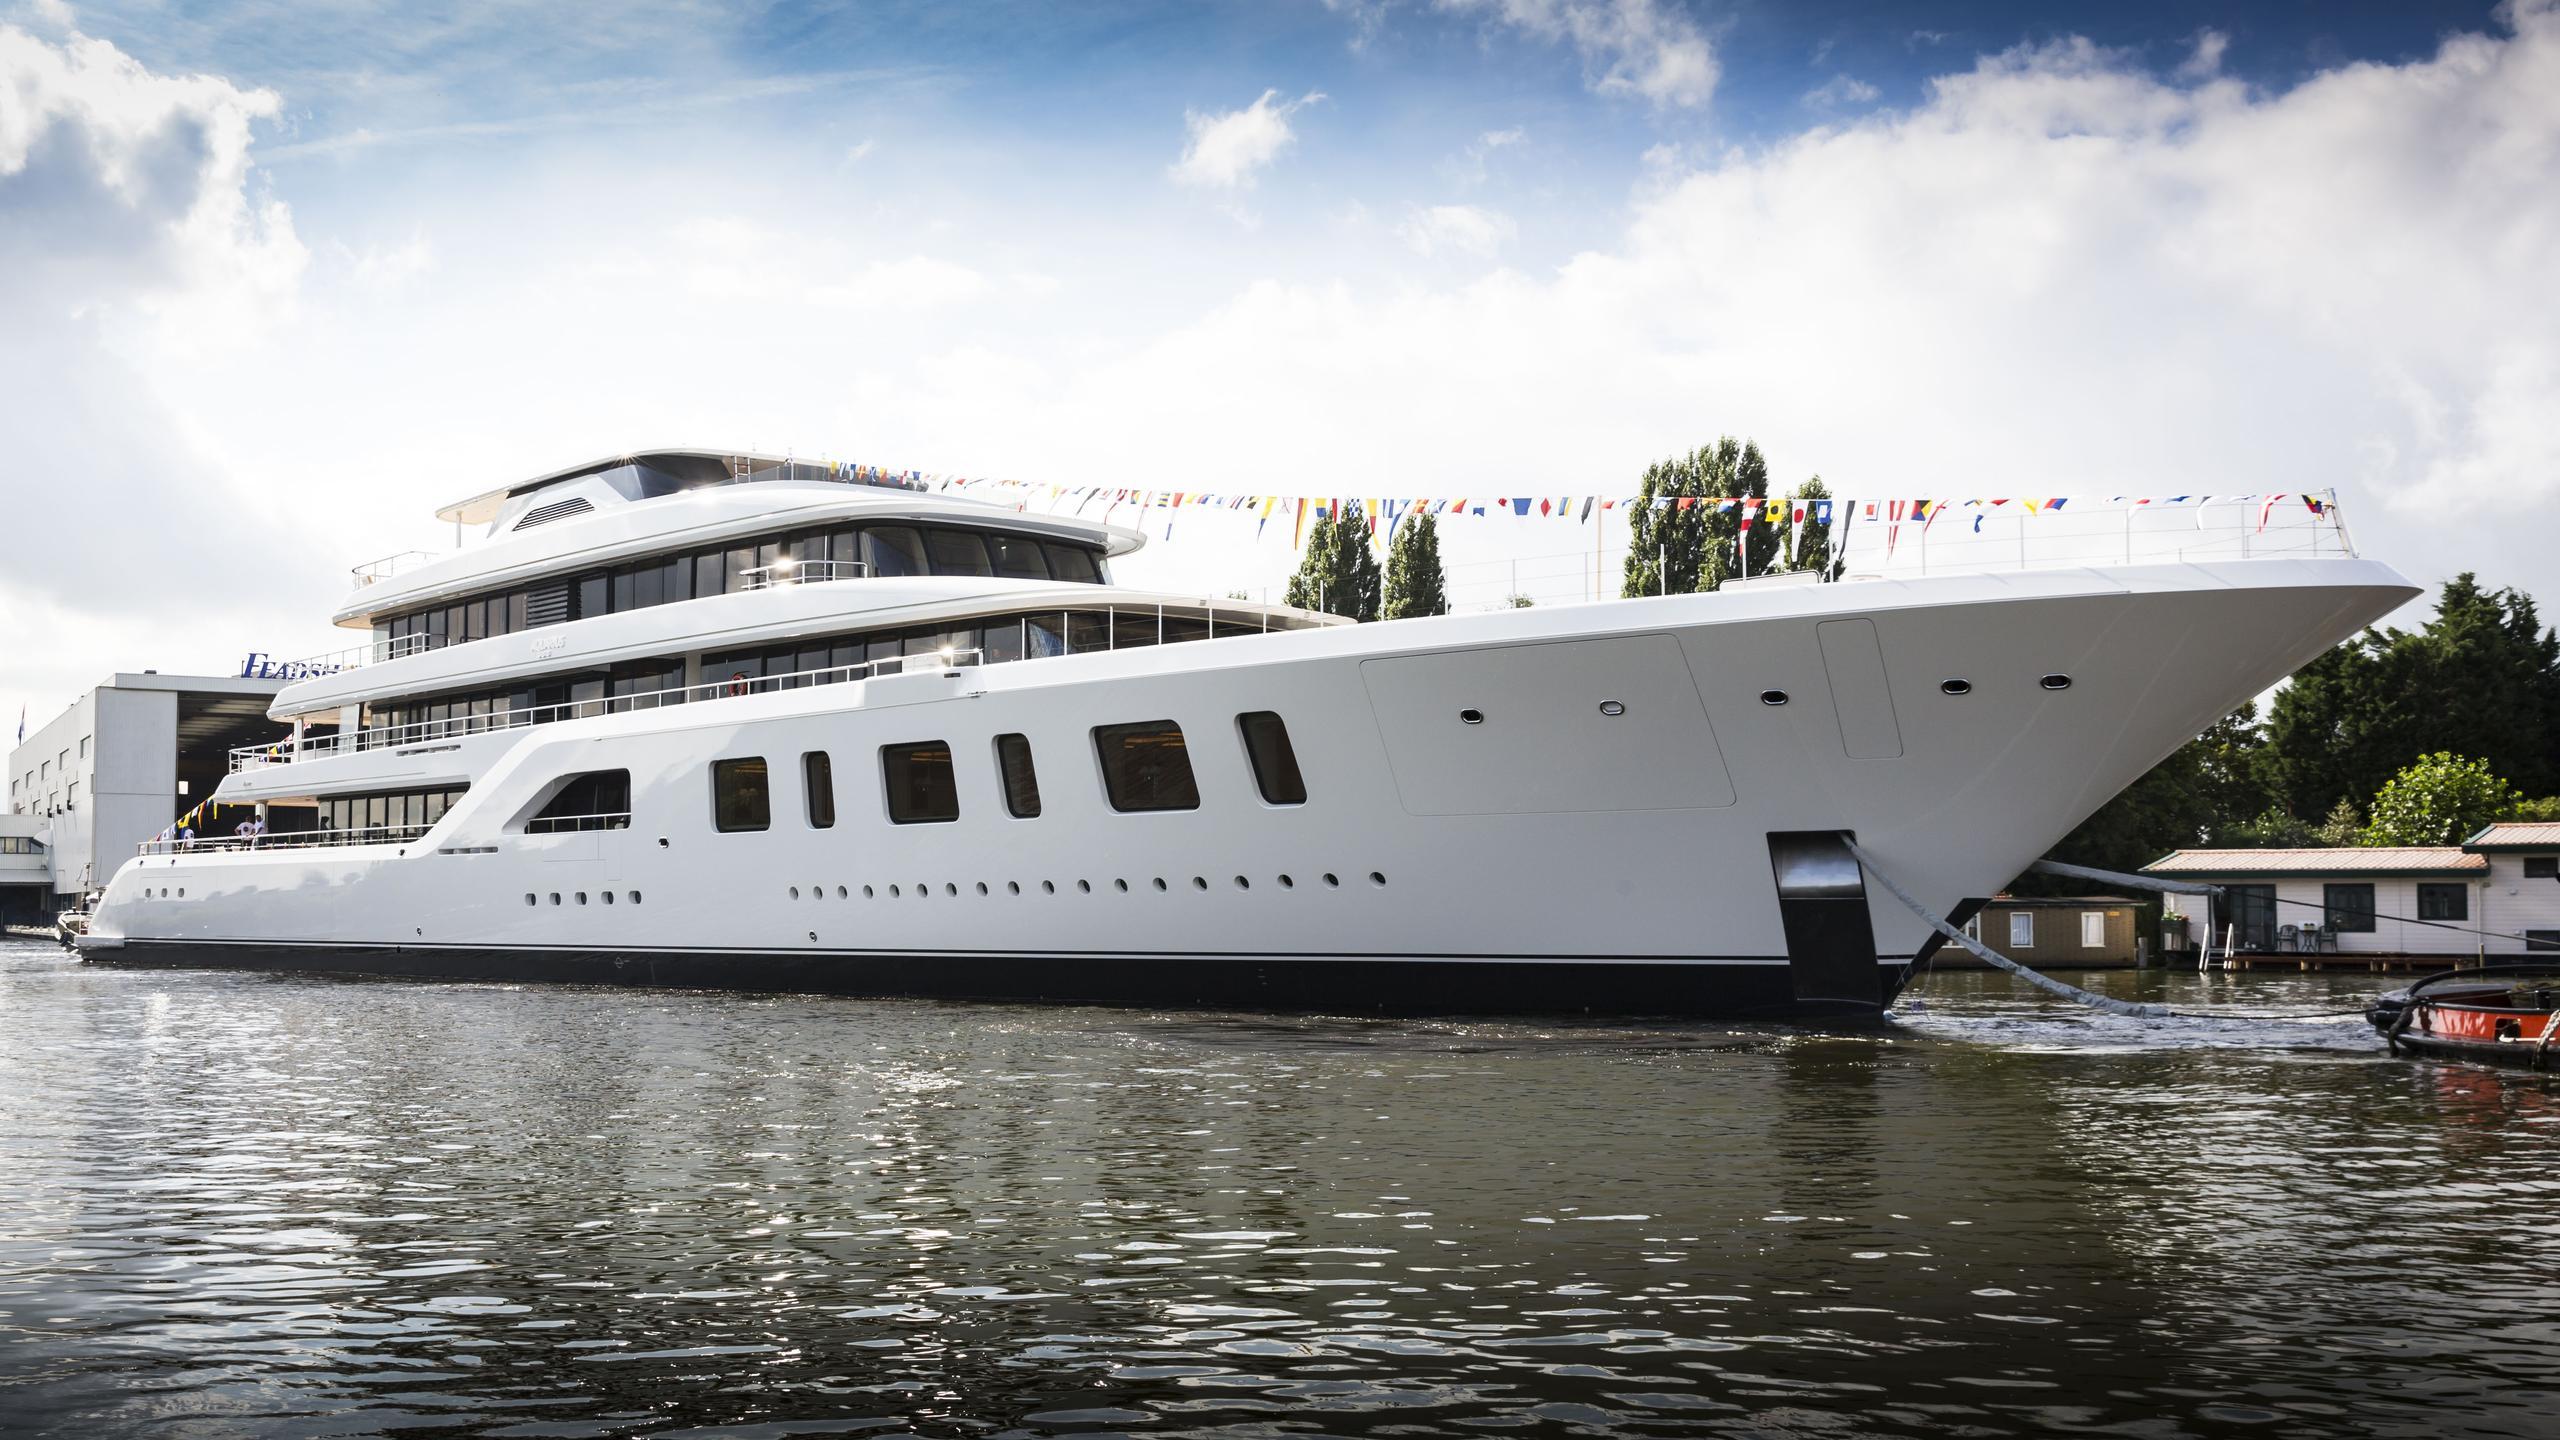 aquarius motoryacht feadship 2016 92m half profile launch